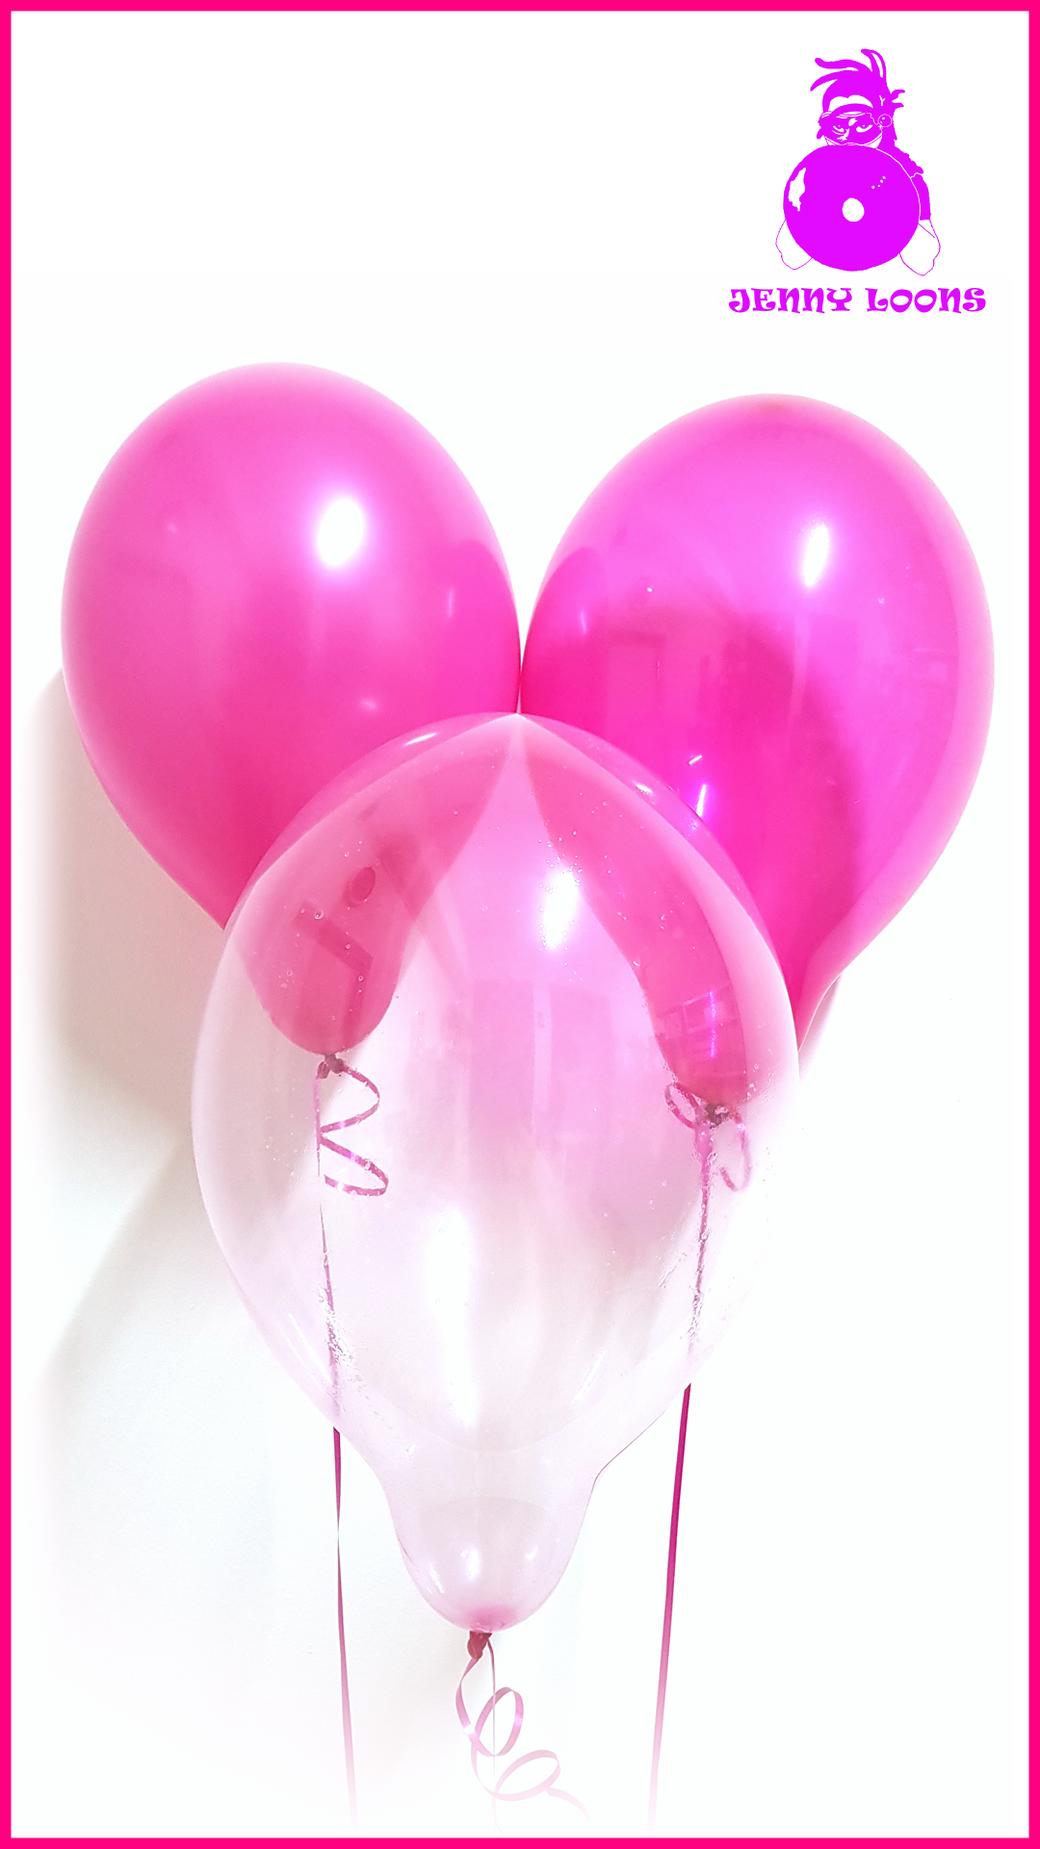 Belbal B105 Pastel Kristall Soap Crystal Luftballons Dekoration Party Farben Heliumballons Balloons